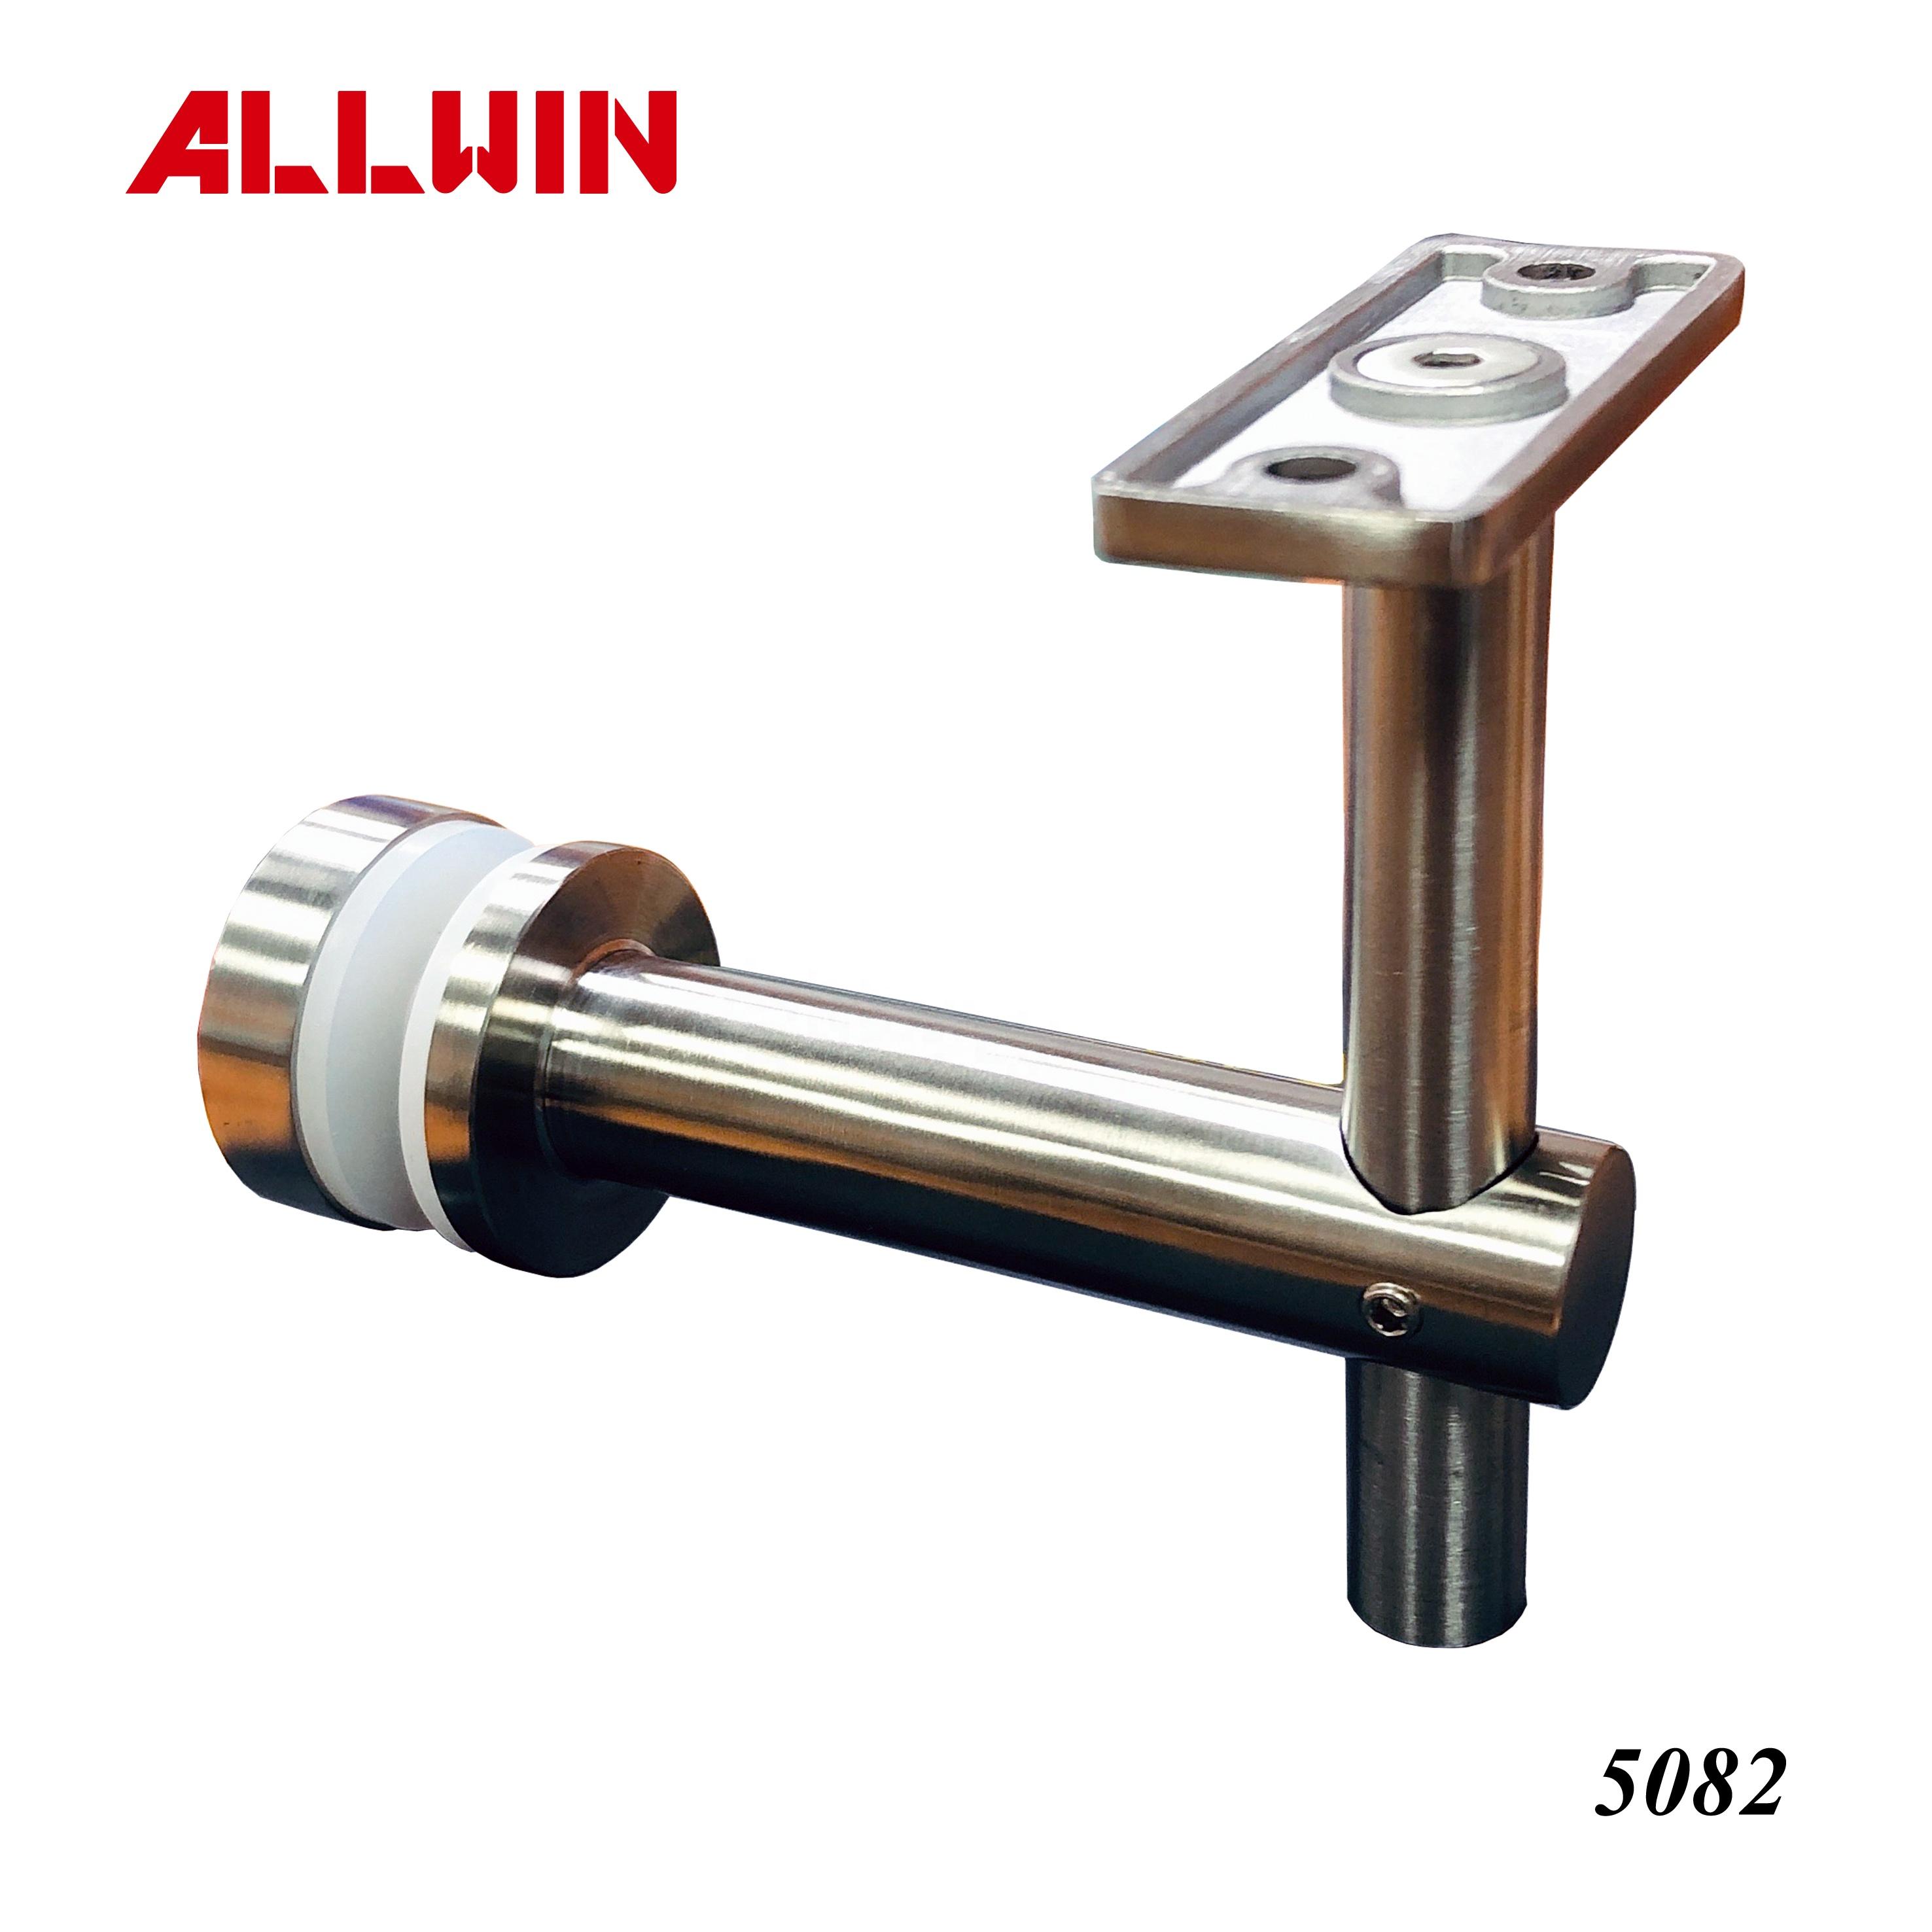 80mm distance Stainless Steel Mounted Adjustable Handrail Bracket